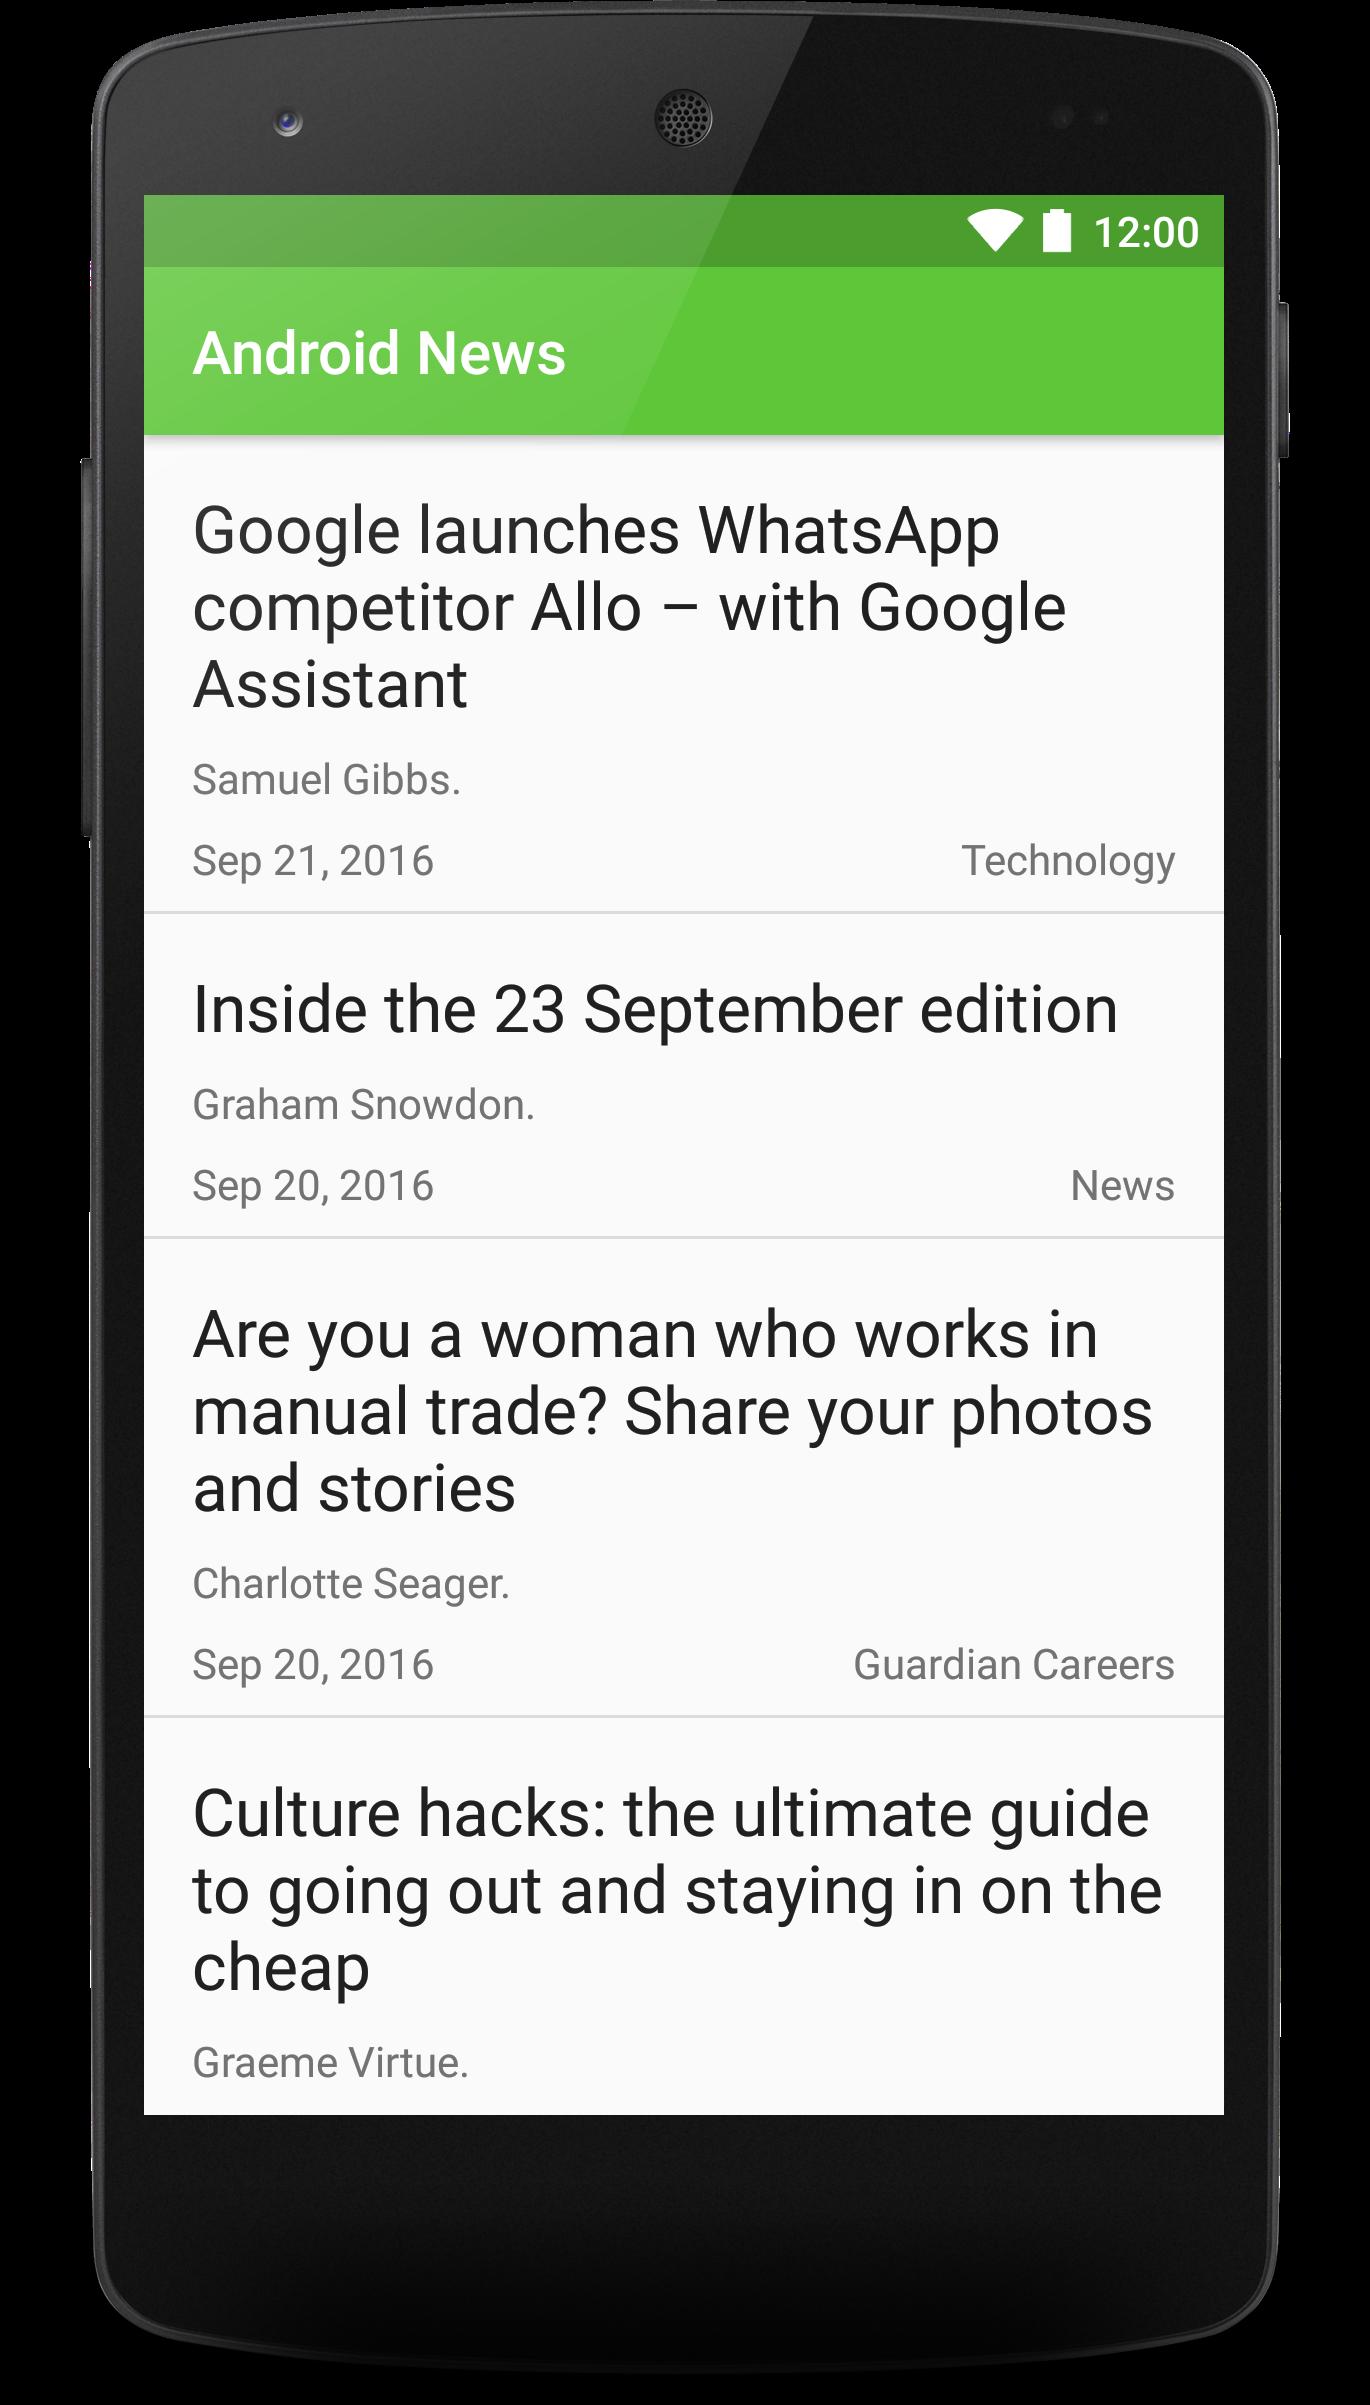 GitHub - laramartin/android_newsfeed: News feed app project